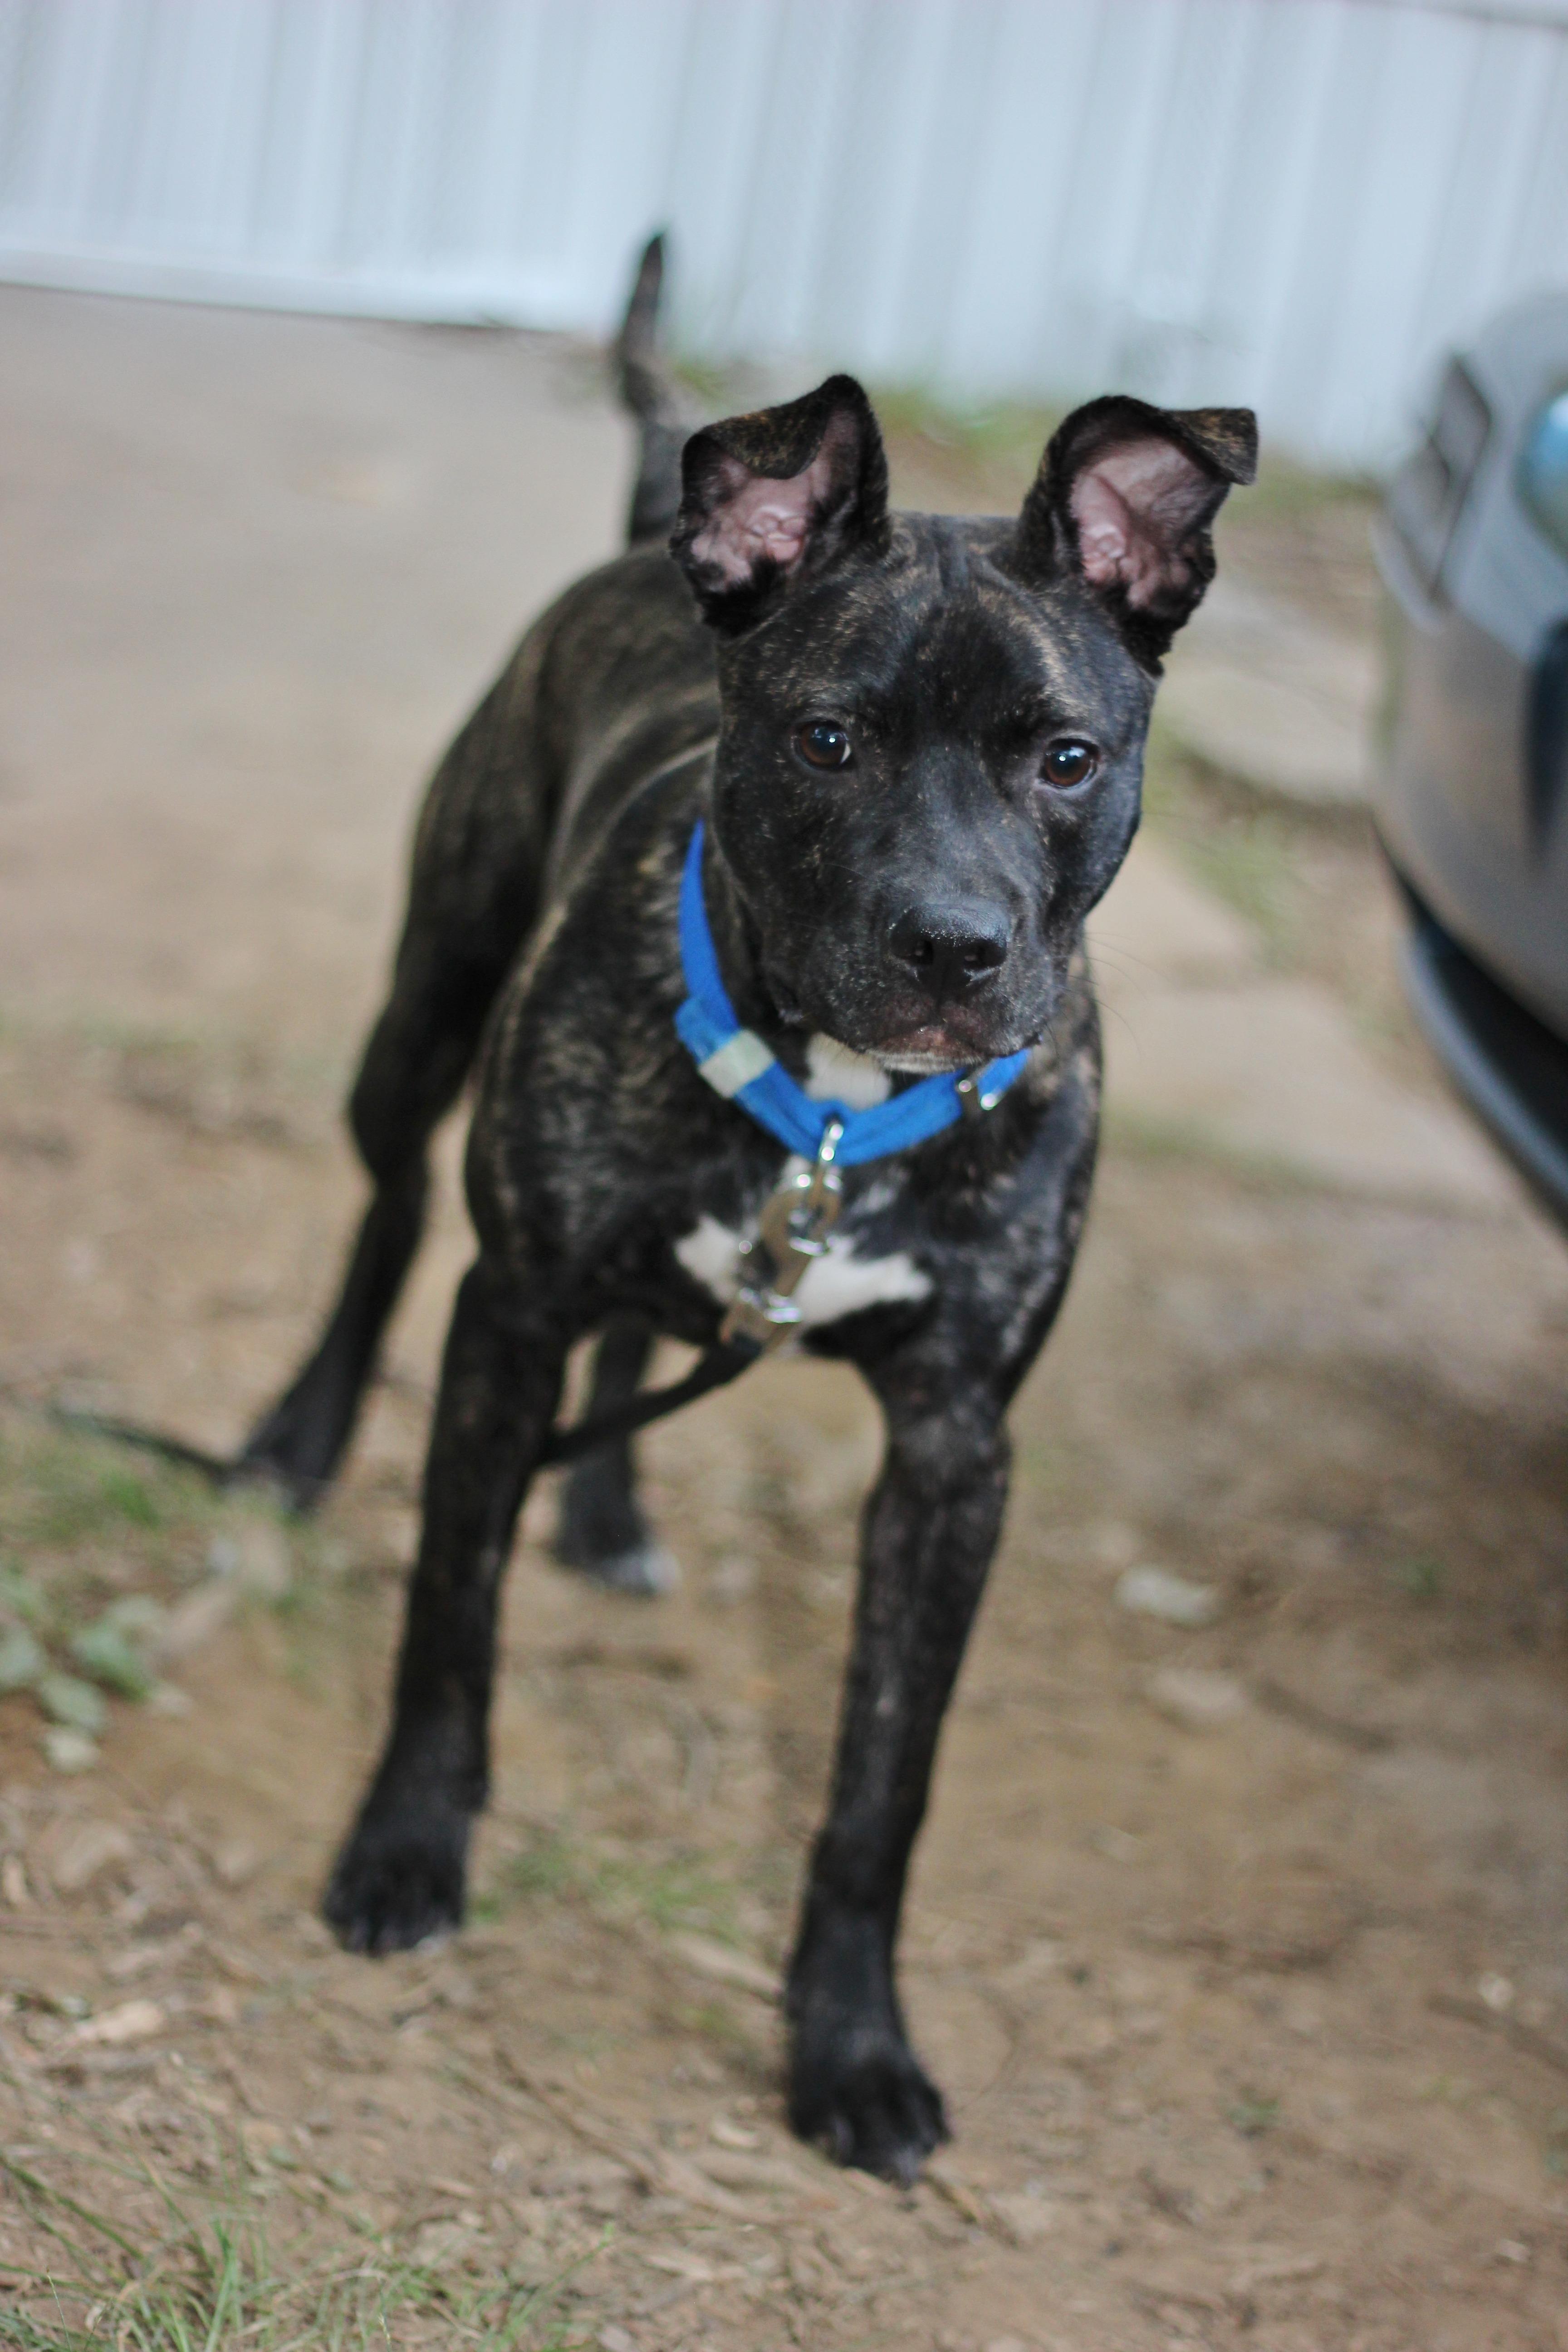 Cool Bulldog Canine Adorable Dog - puppy-dog-animal-canine-pet-fur-young-mammal-bulldog-outdoors-vertebrate-domestic-adorable-dog-breed-terrier-guard-dog-patterdale-terrier-dog-like-mammal-carnivoran-983261  Snapshot_372096  .jpg